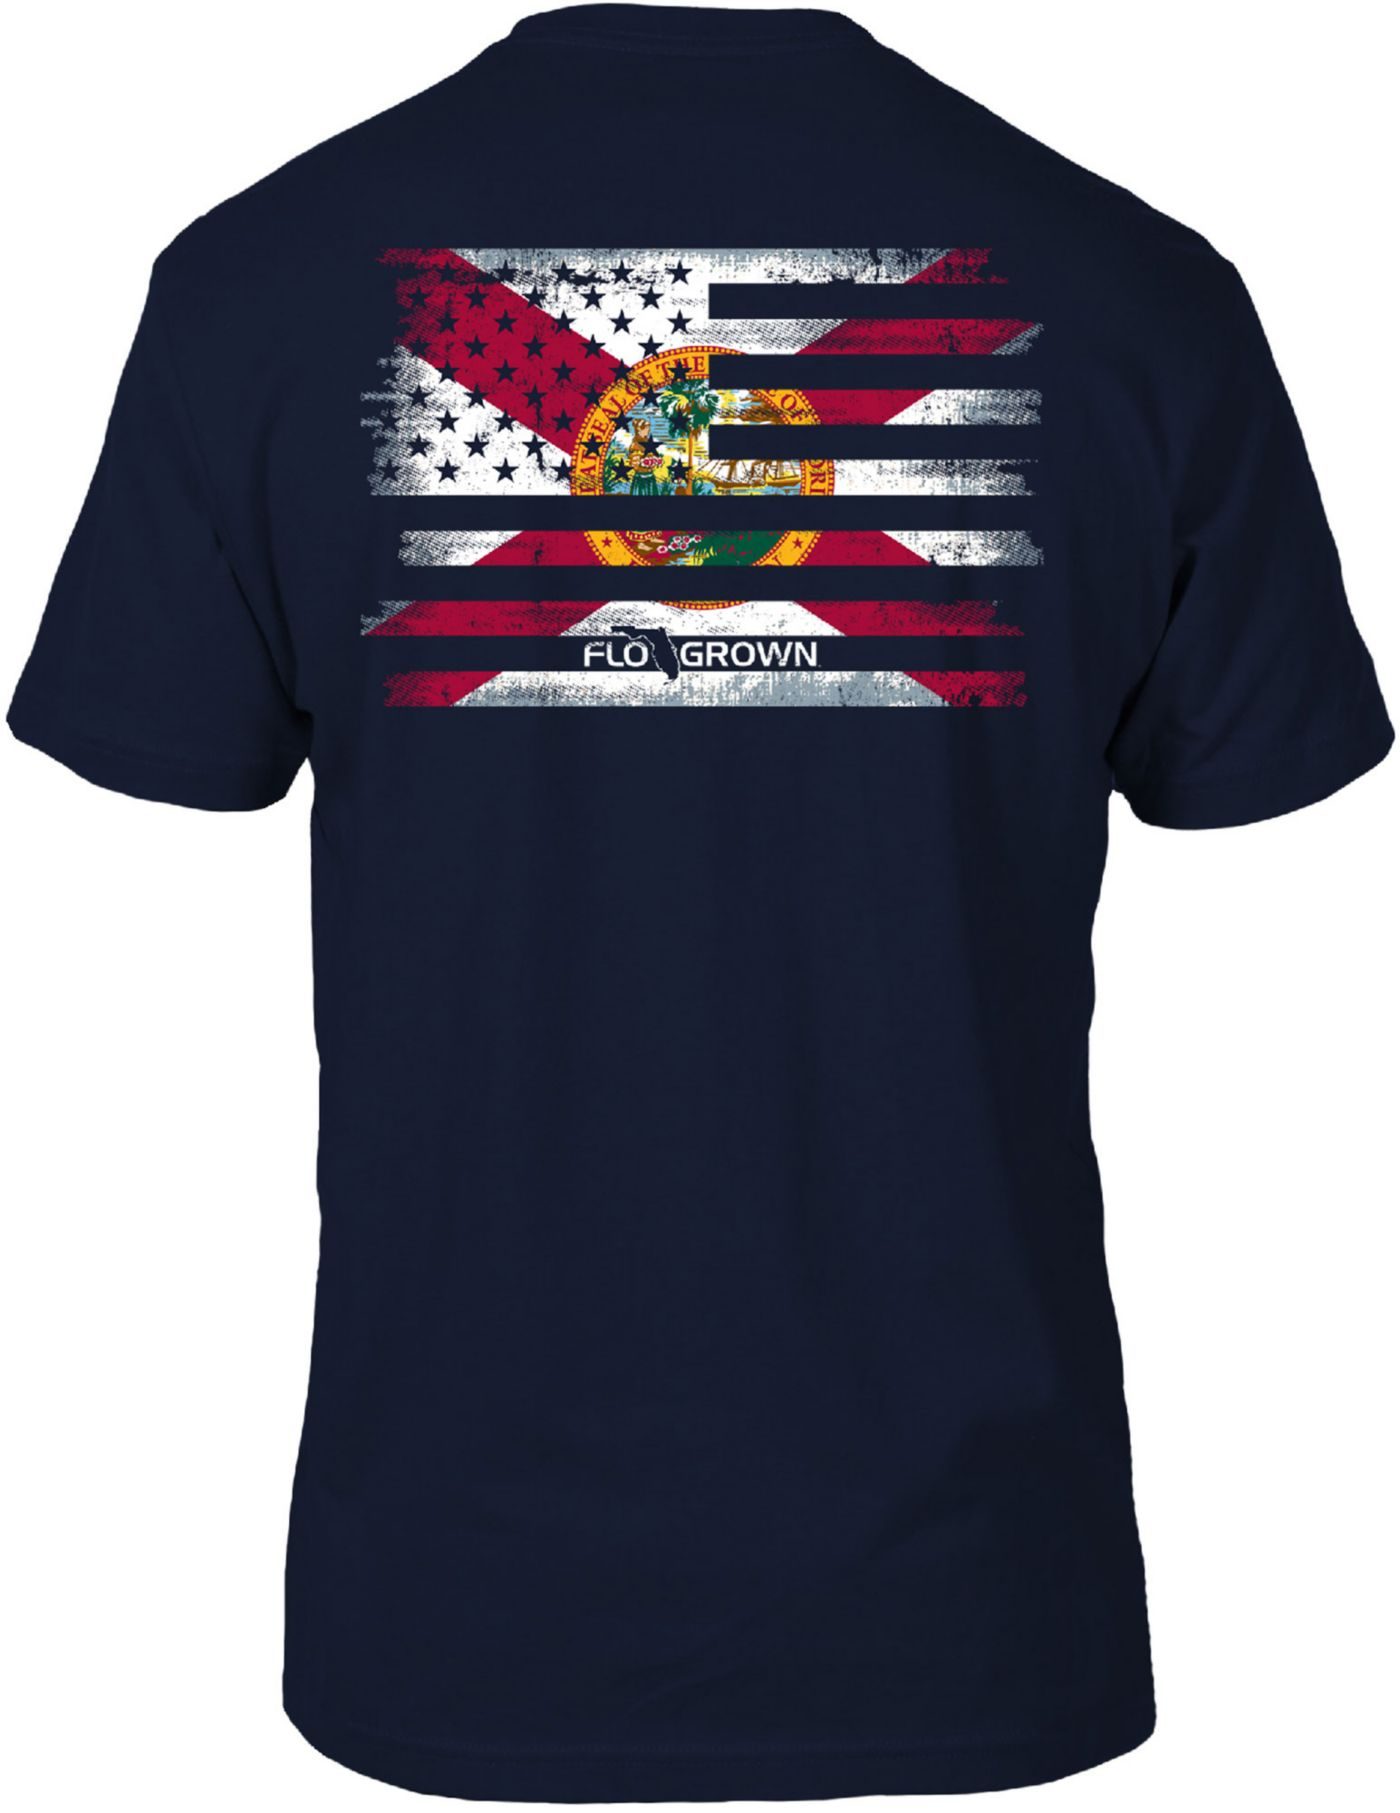 FloGrown Men's Flag Mash Up Short Sleeve T-Shirt